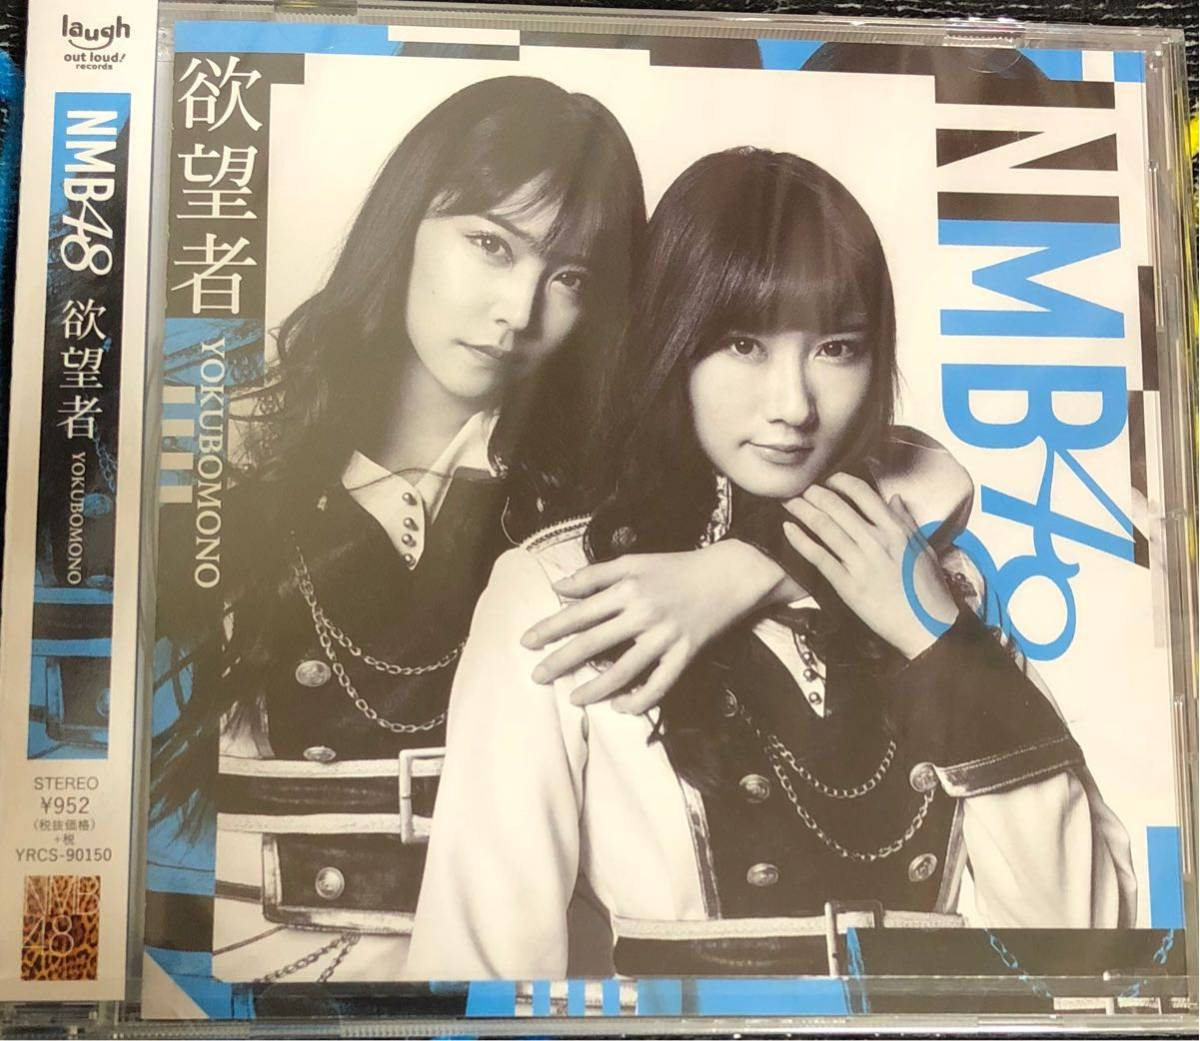 ☆NMB48 18thシングル 欲望者 劇場版CD☆ 握手券なし 【新品未開封】